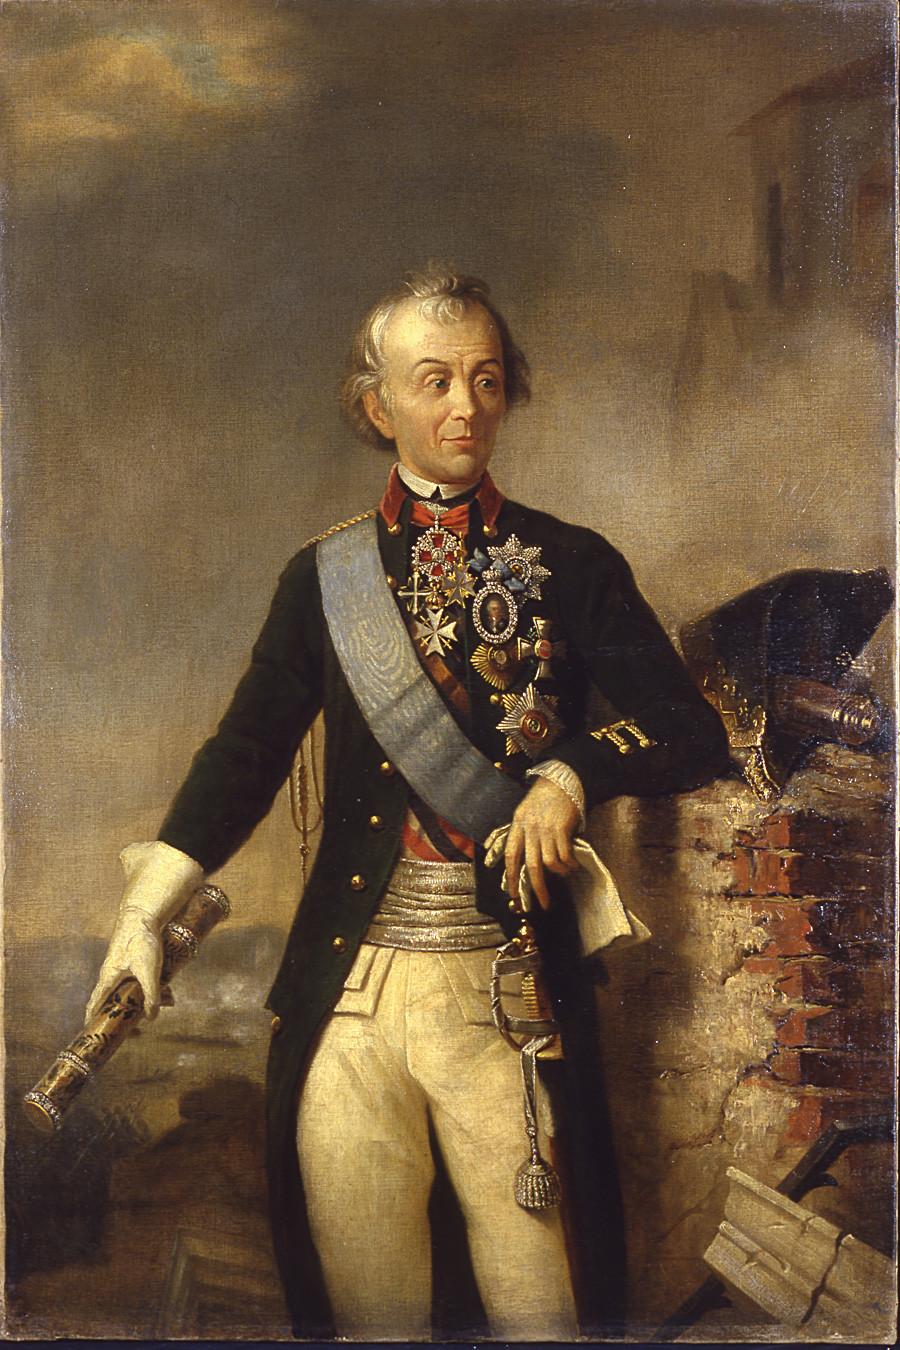 Aleksandr Vassiliévitch Suvorov de Rimnik, príncipe da Itália 1729–1800)